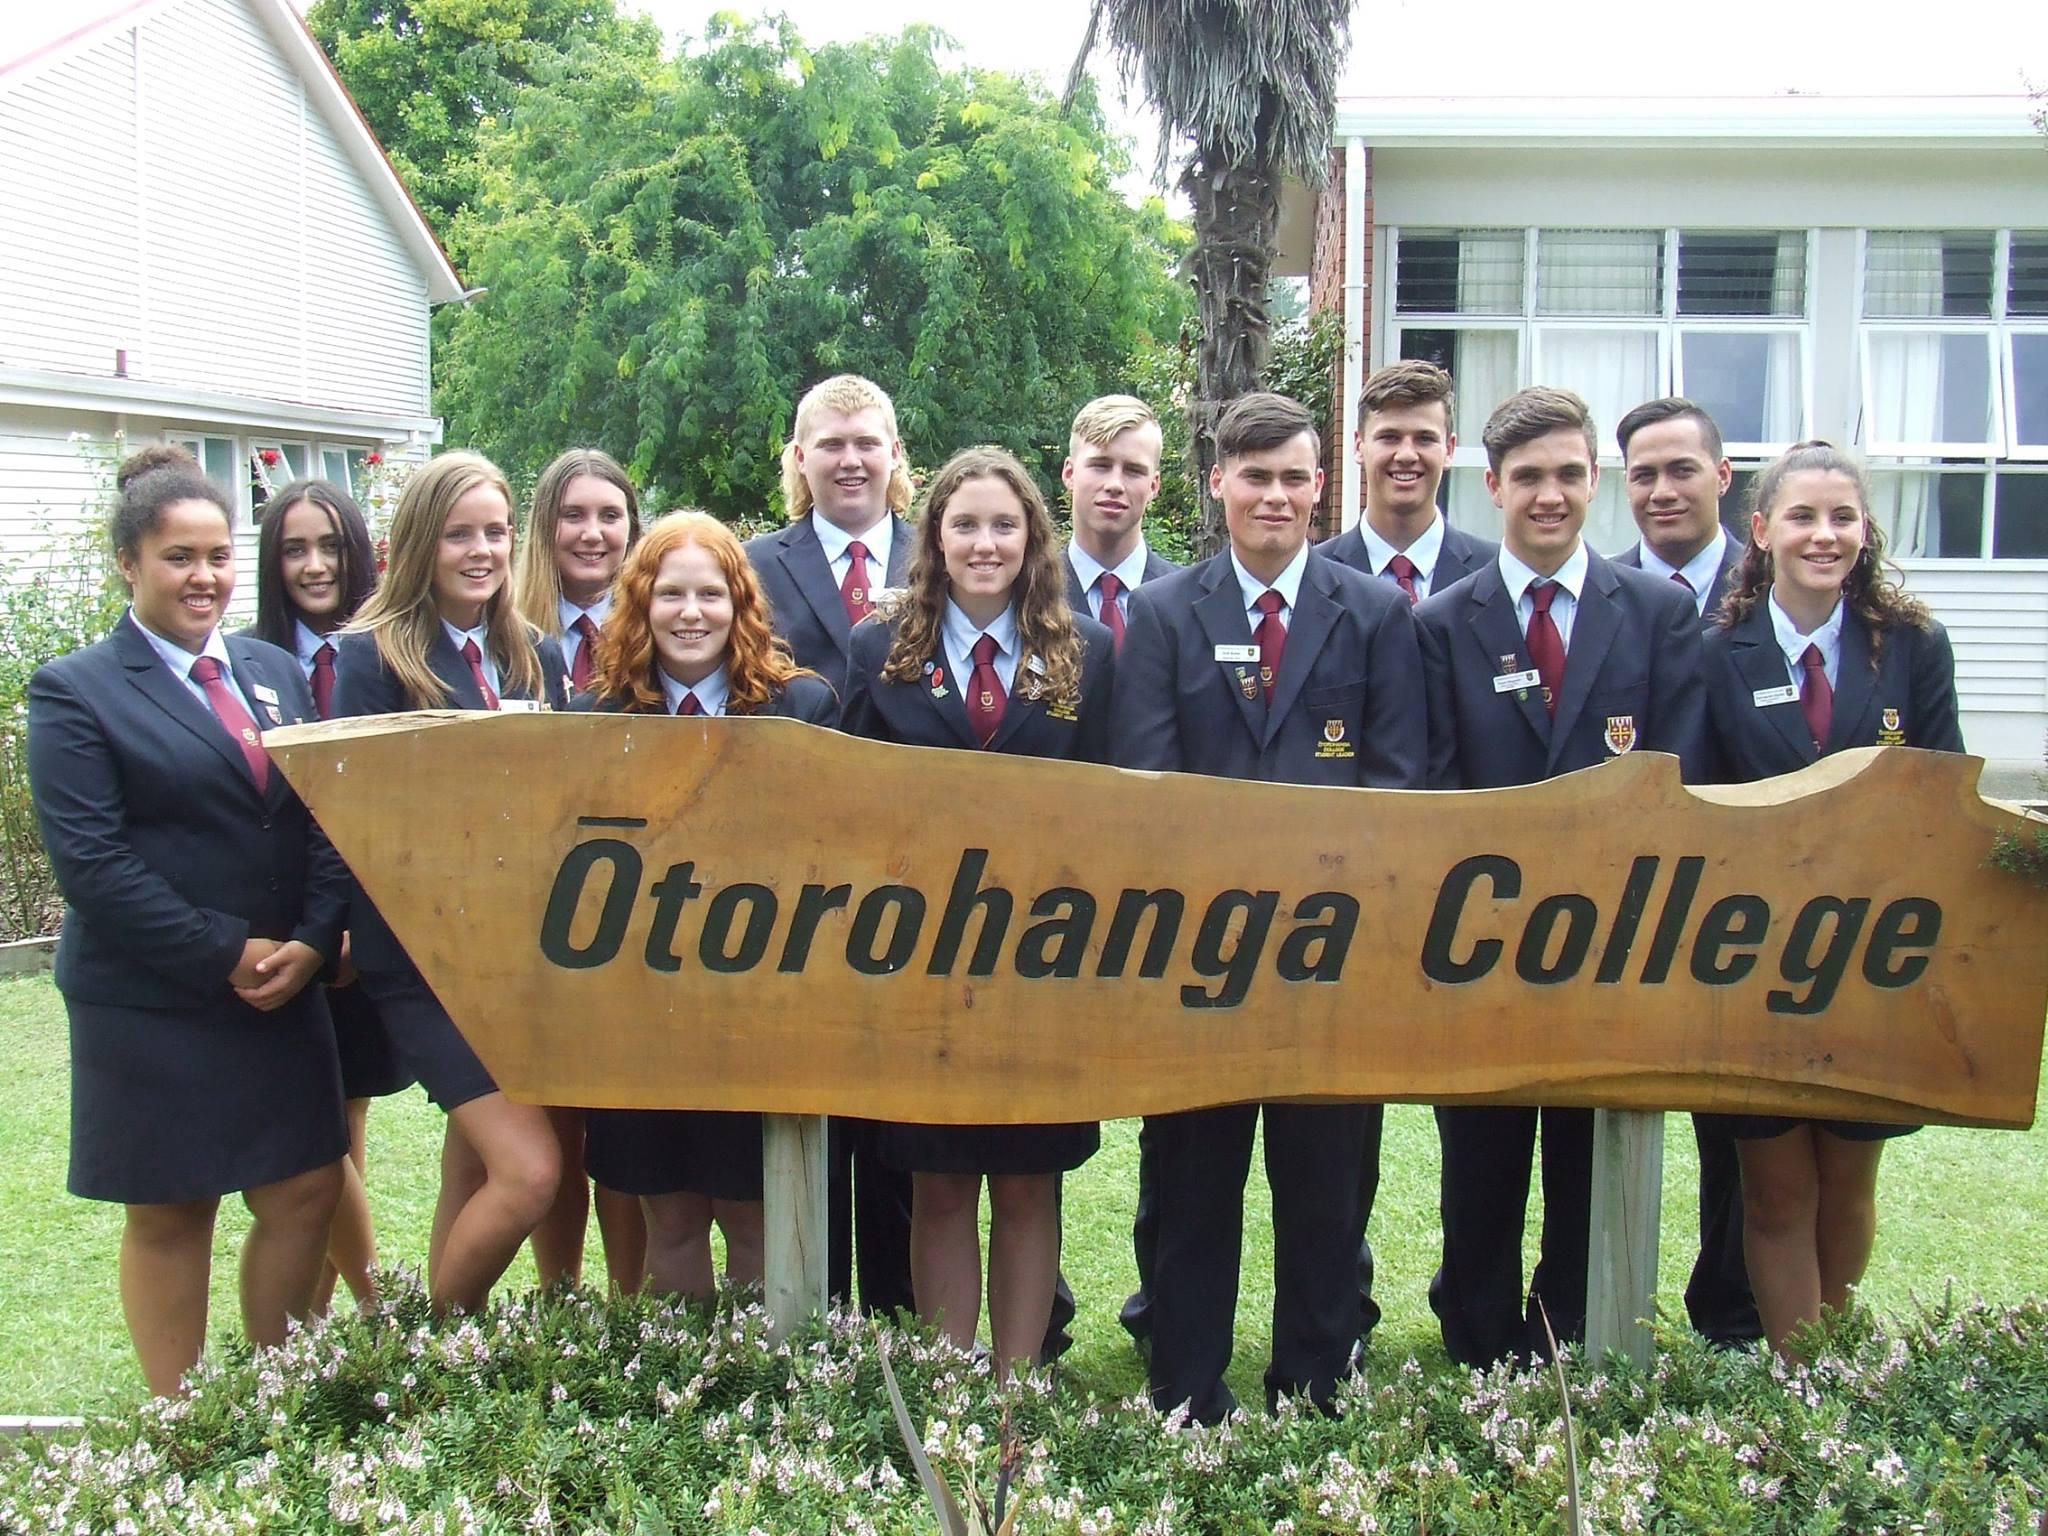 Otorohanga College